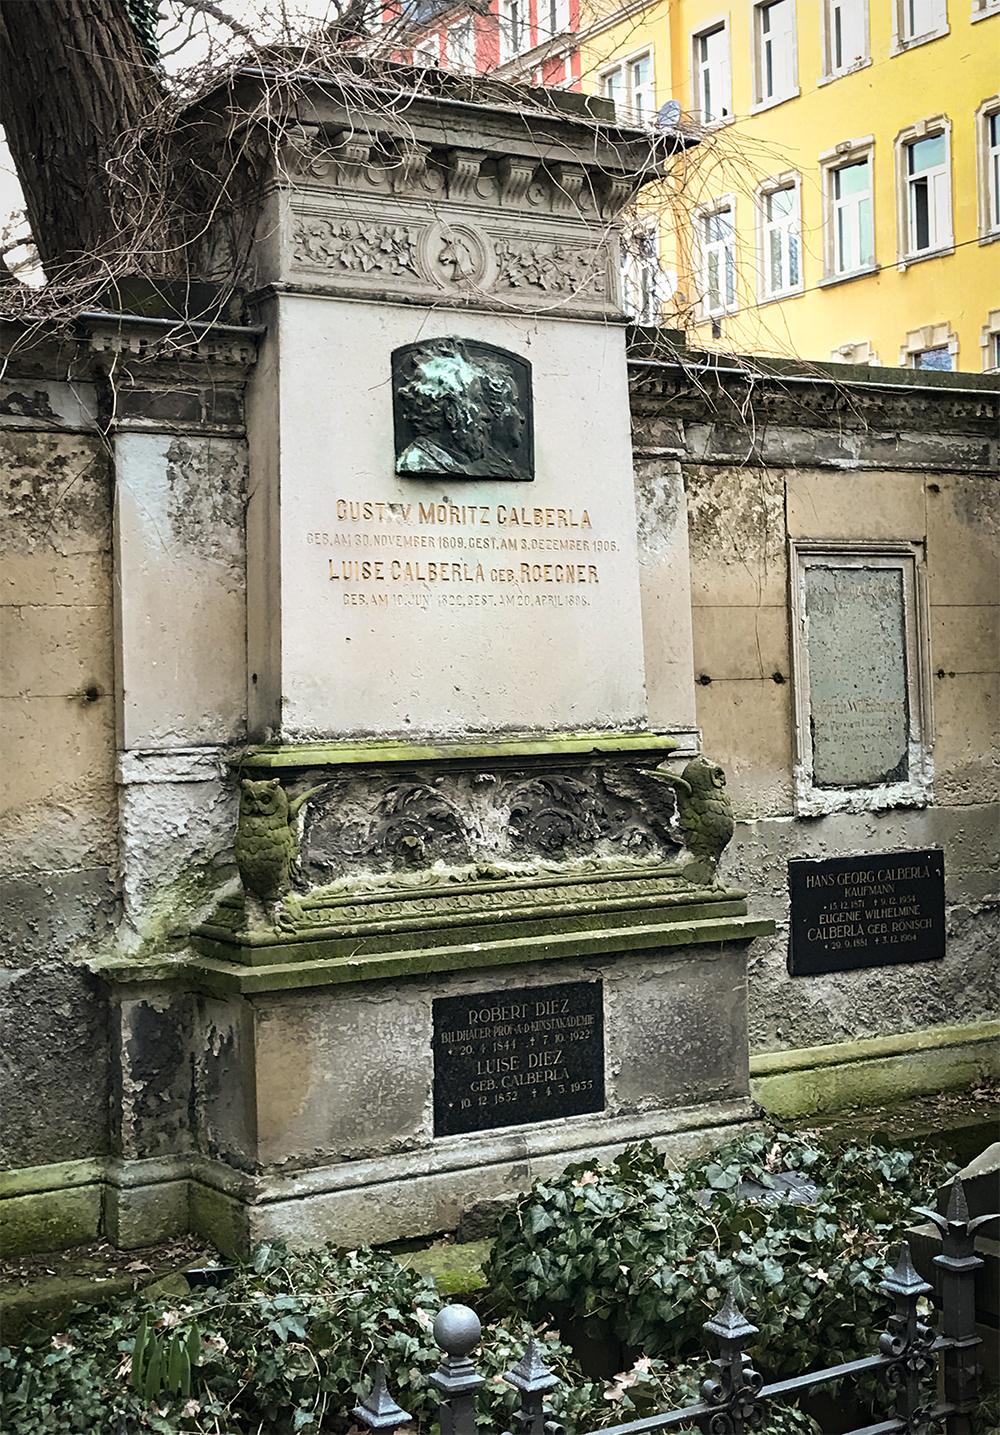 Die Grabstätte des ehemaligen Besitzers auf den Dresdener inneren Neustädter Friedhof; Quelle: http://www.stadtwikidd.de/sw/images/6/6b/Calberla.jpg